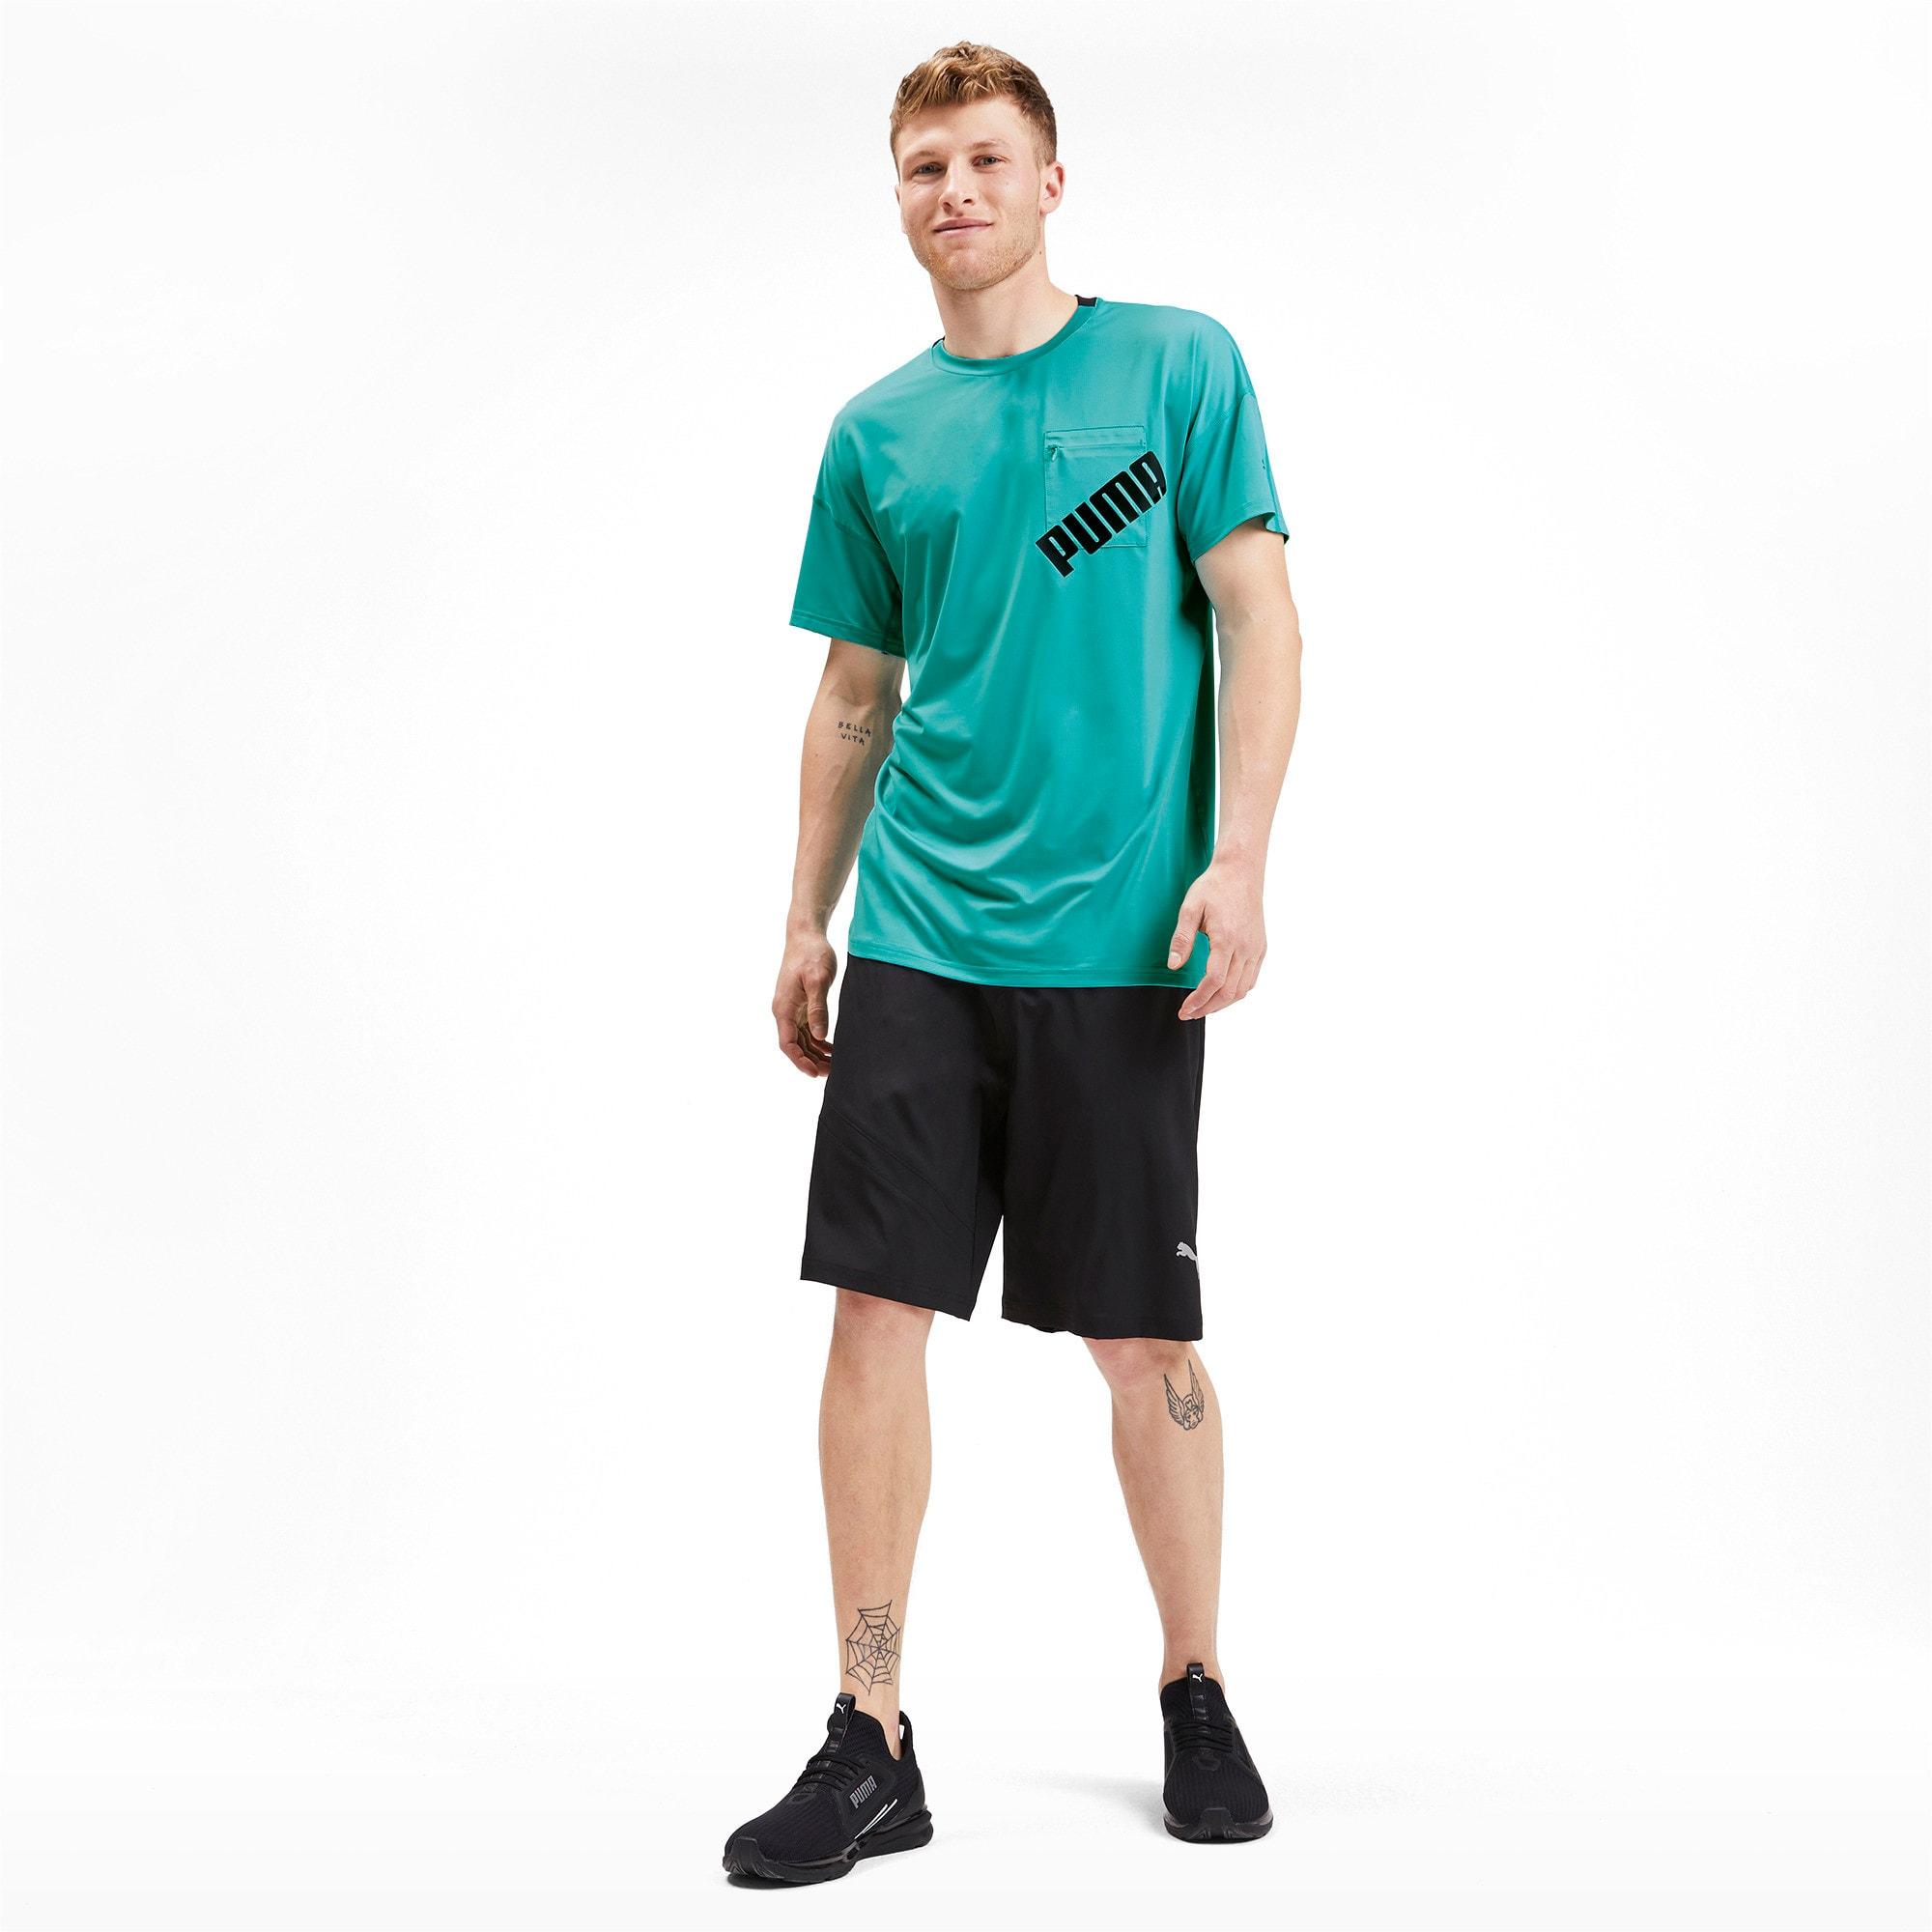 Thumbnail 3 of Get Fast Excite hardloopshirt voor heren, Blue Turquoise-Puma Black, medium